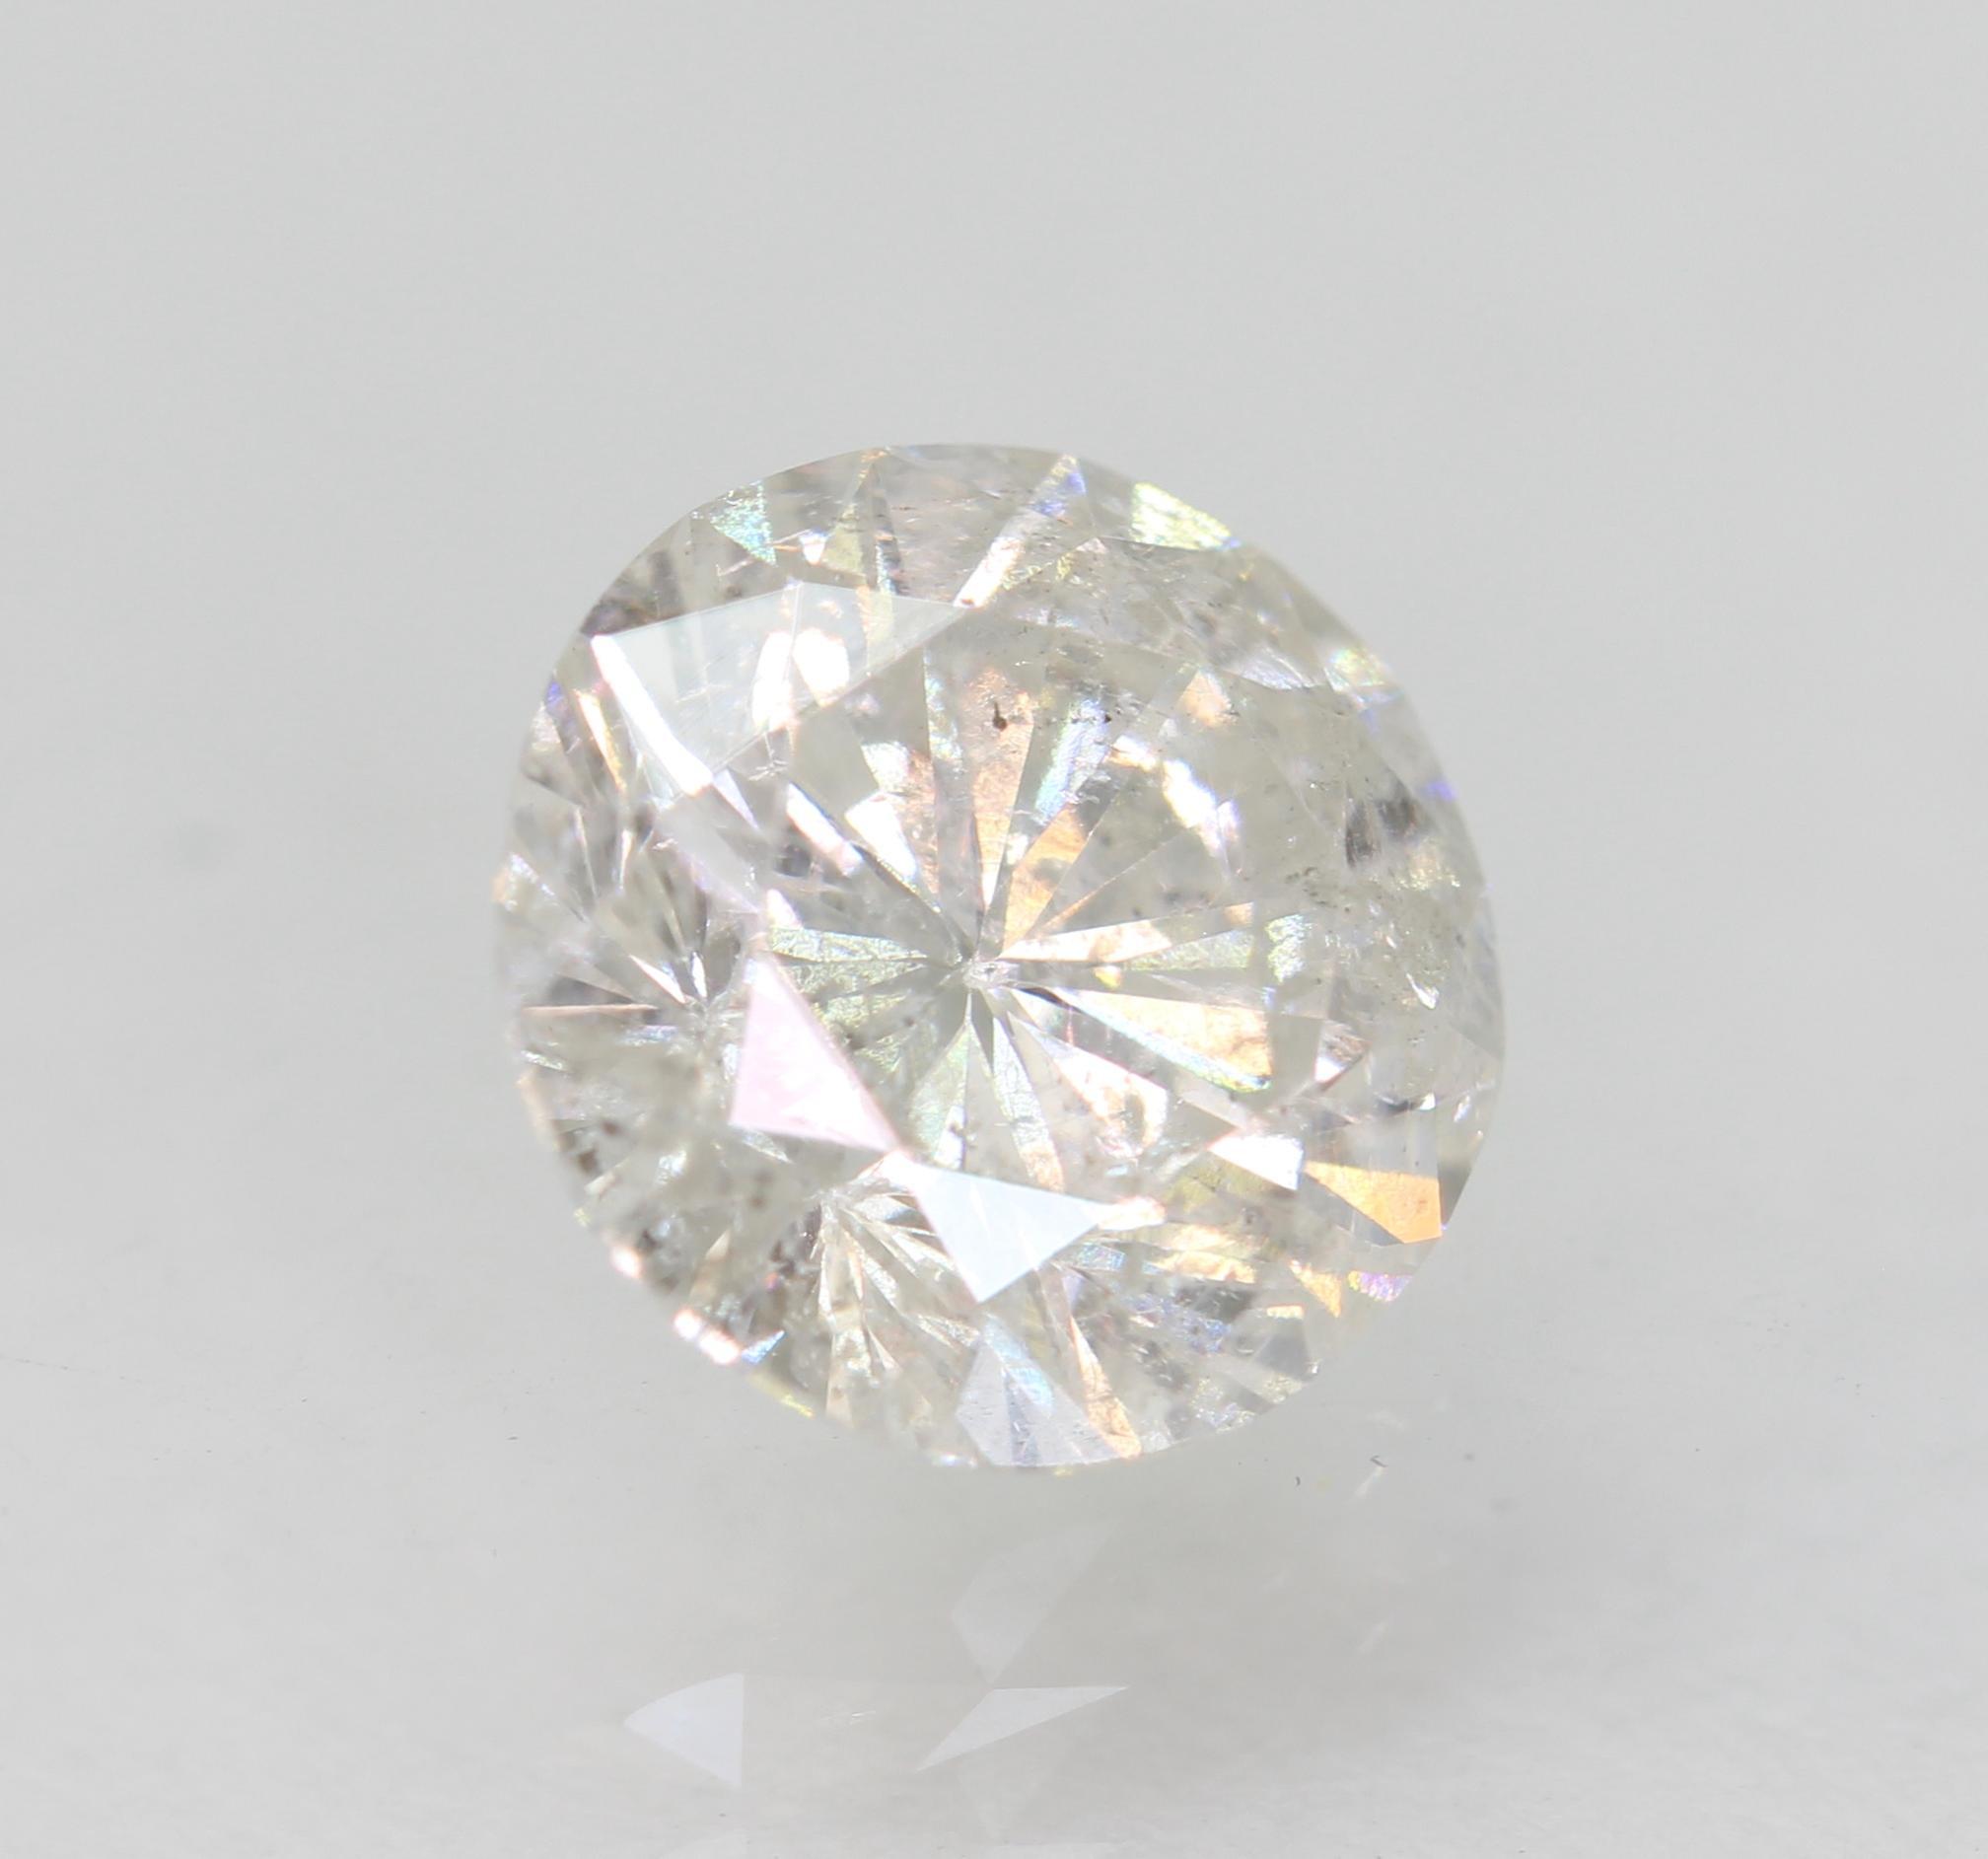 Certified 1.26 Carat E SI2 Round Brilliant Enhanced Natural Loose Diamond 6.97mm